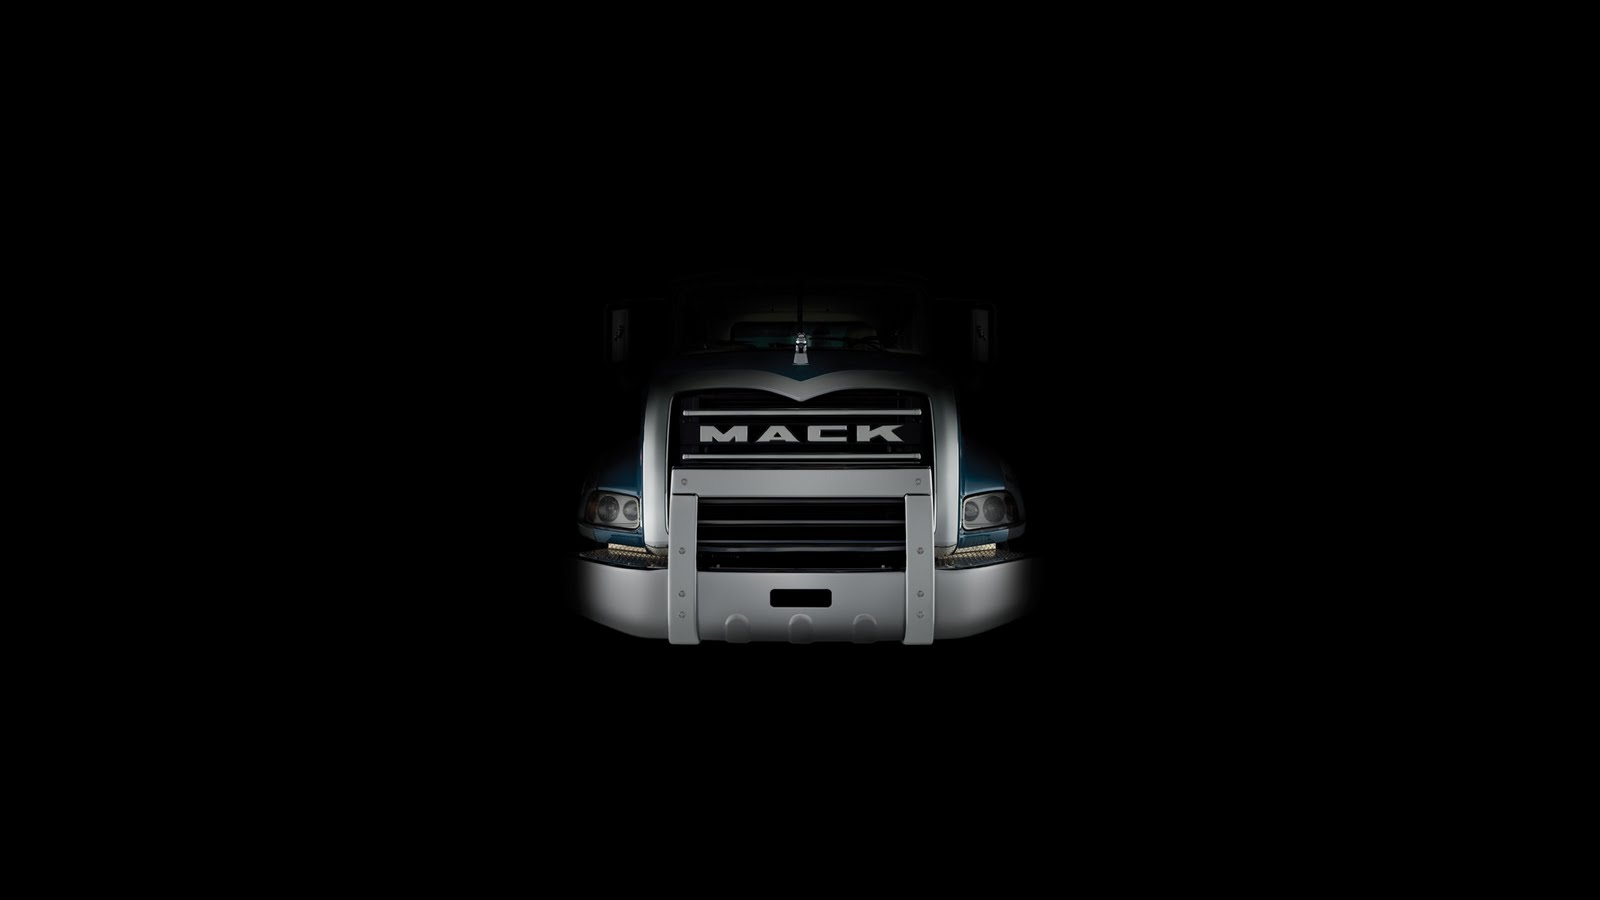 Mack Truck Mack Truck Symbol